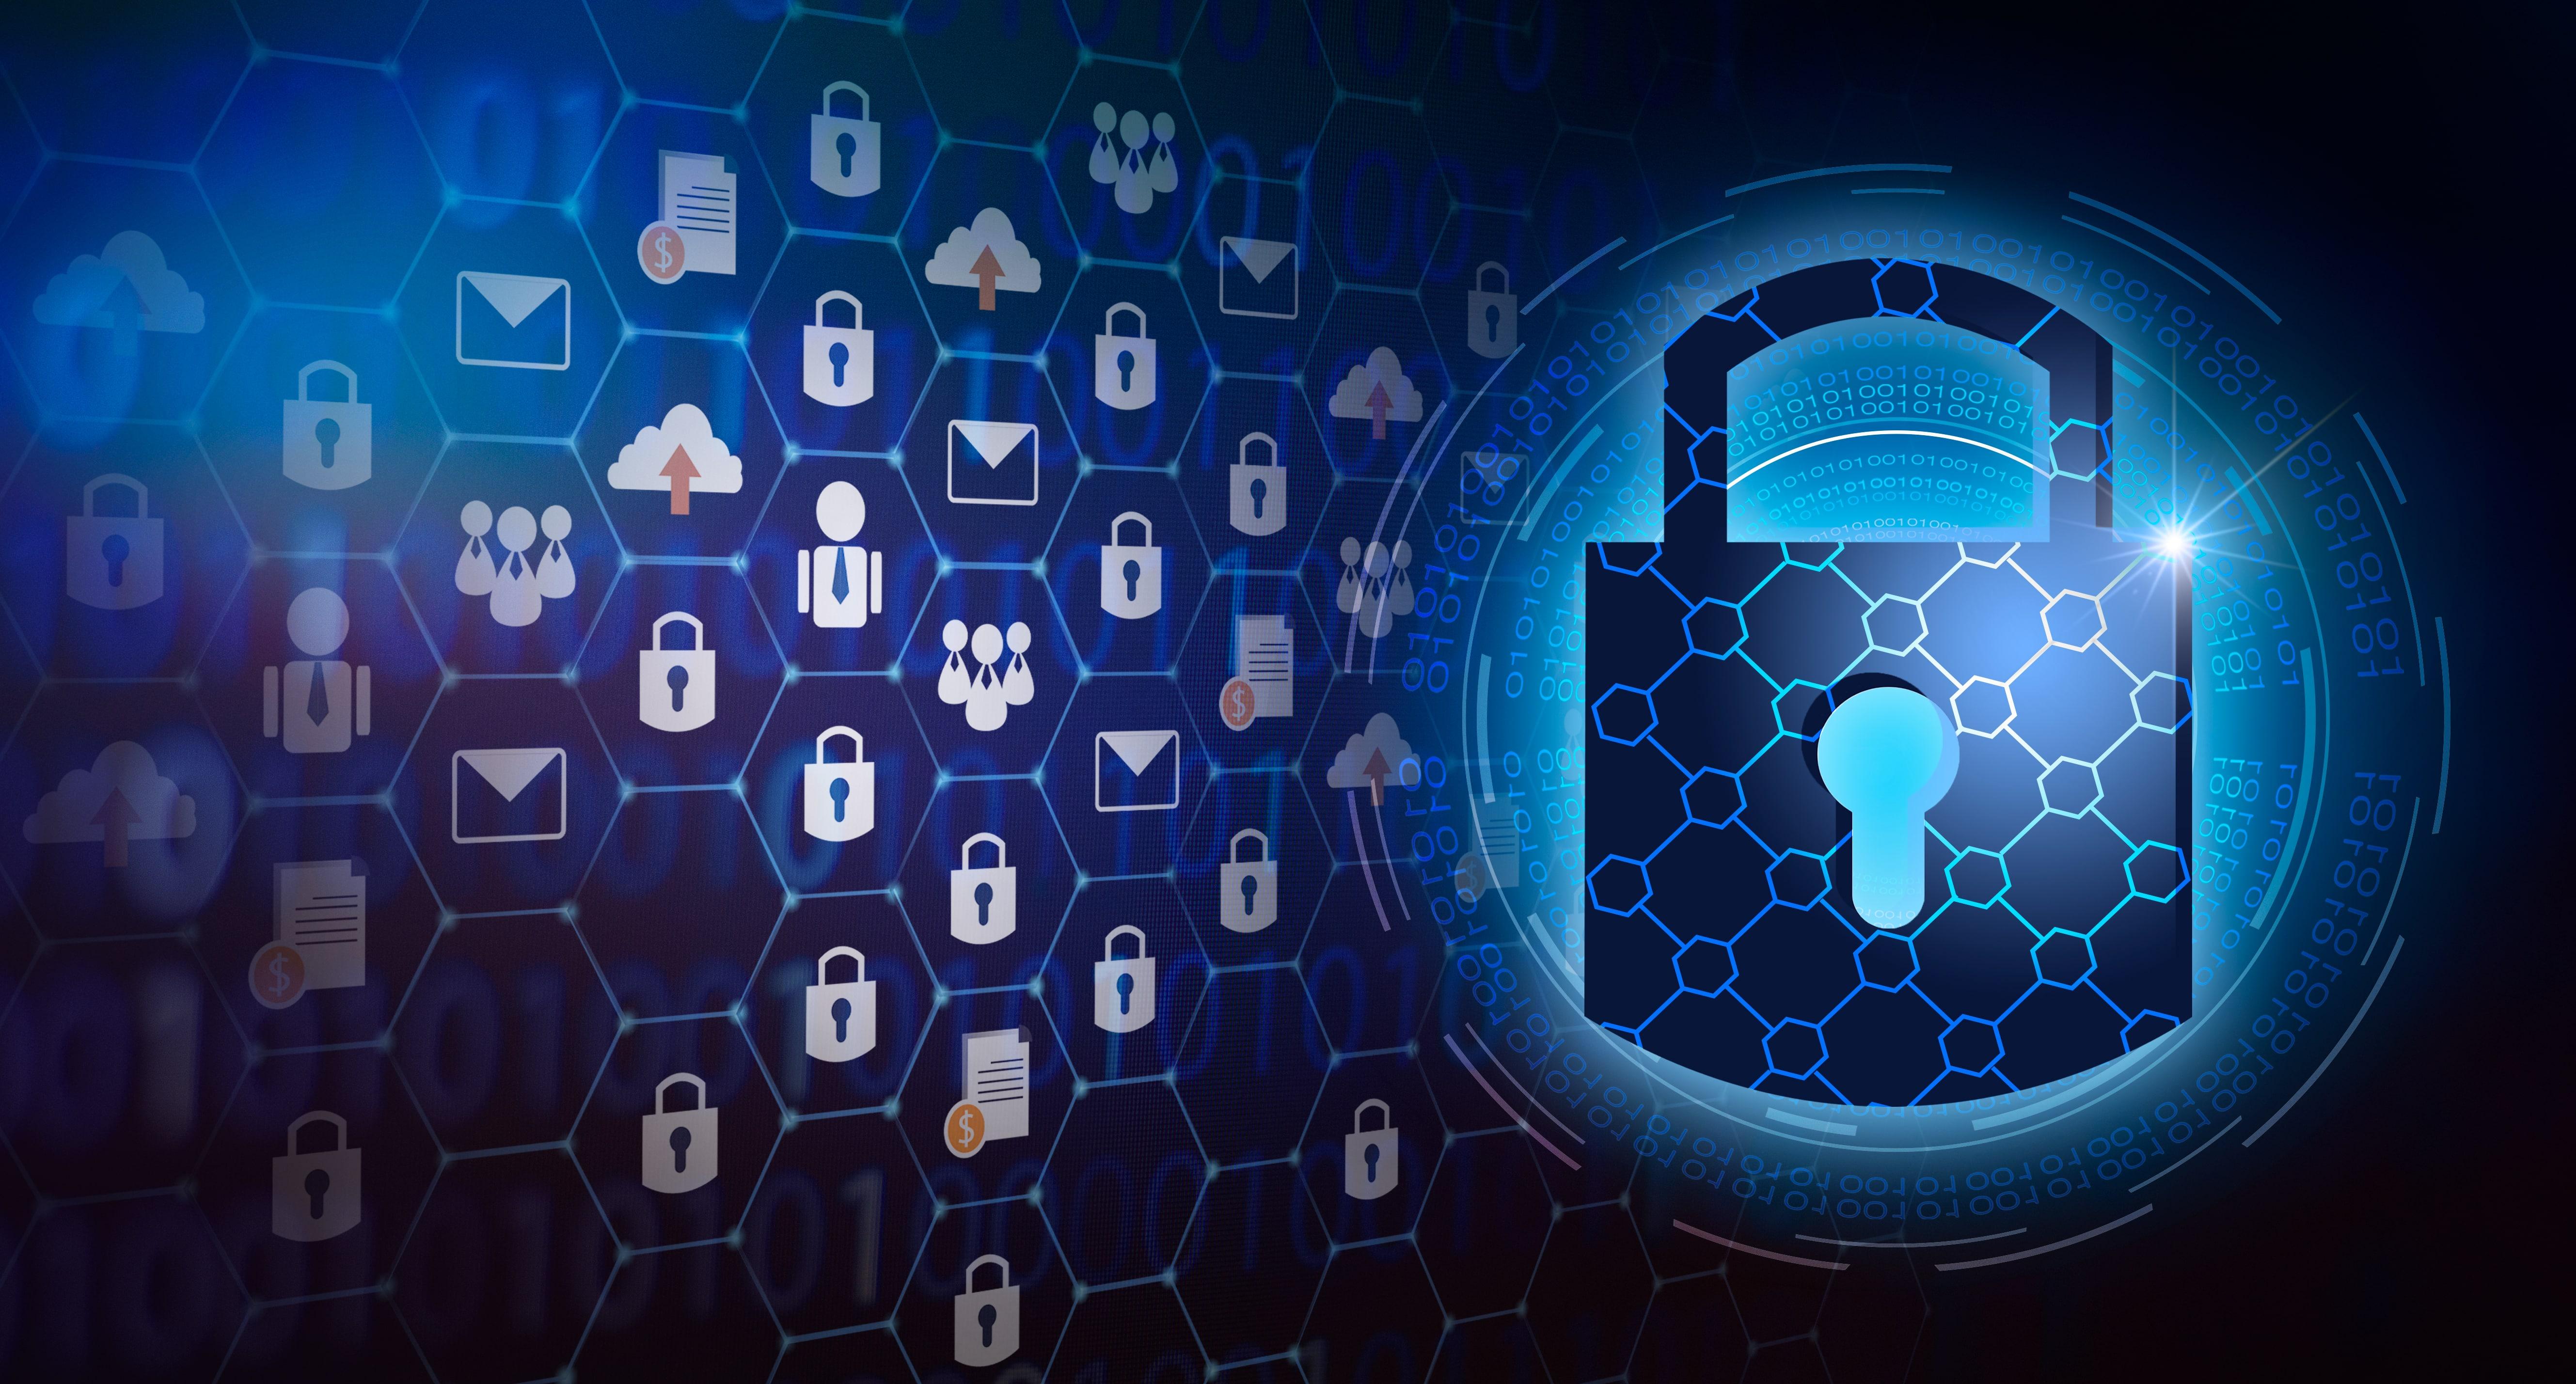 illustration with padlocks showing digital security